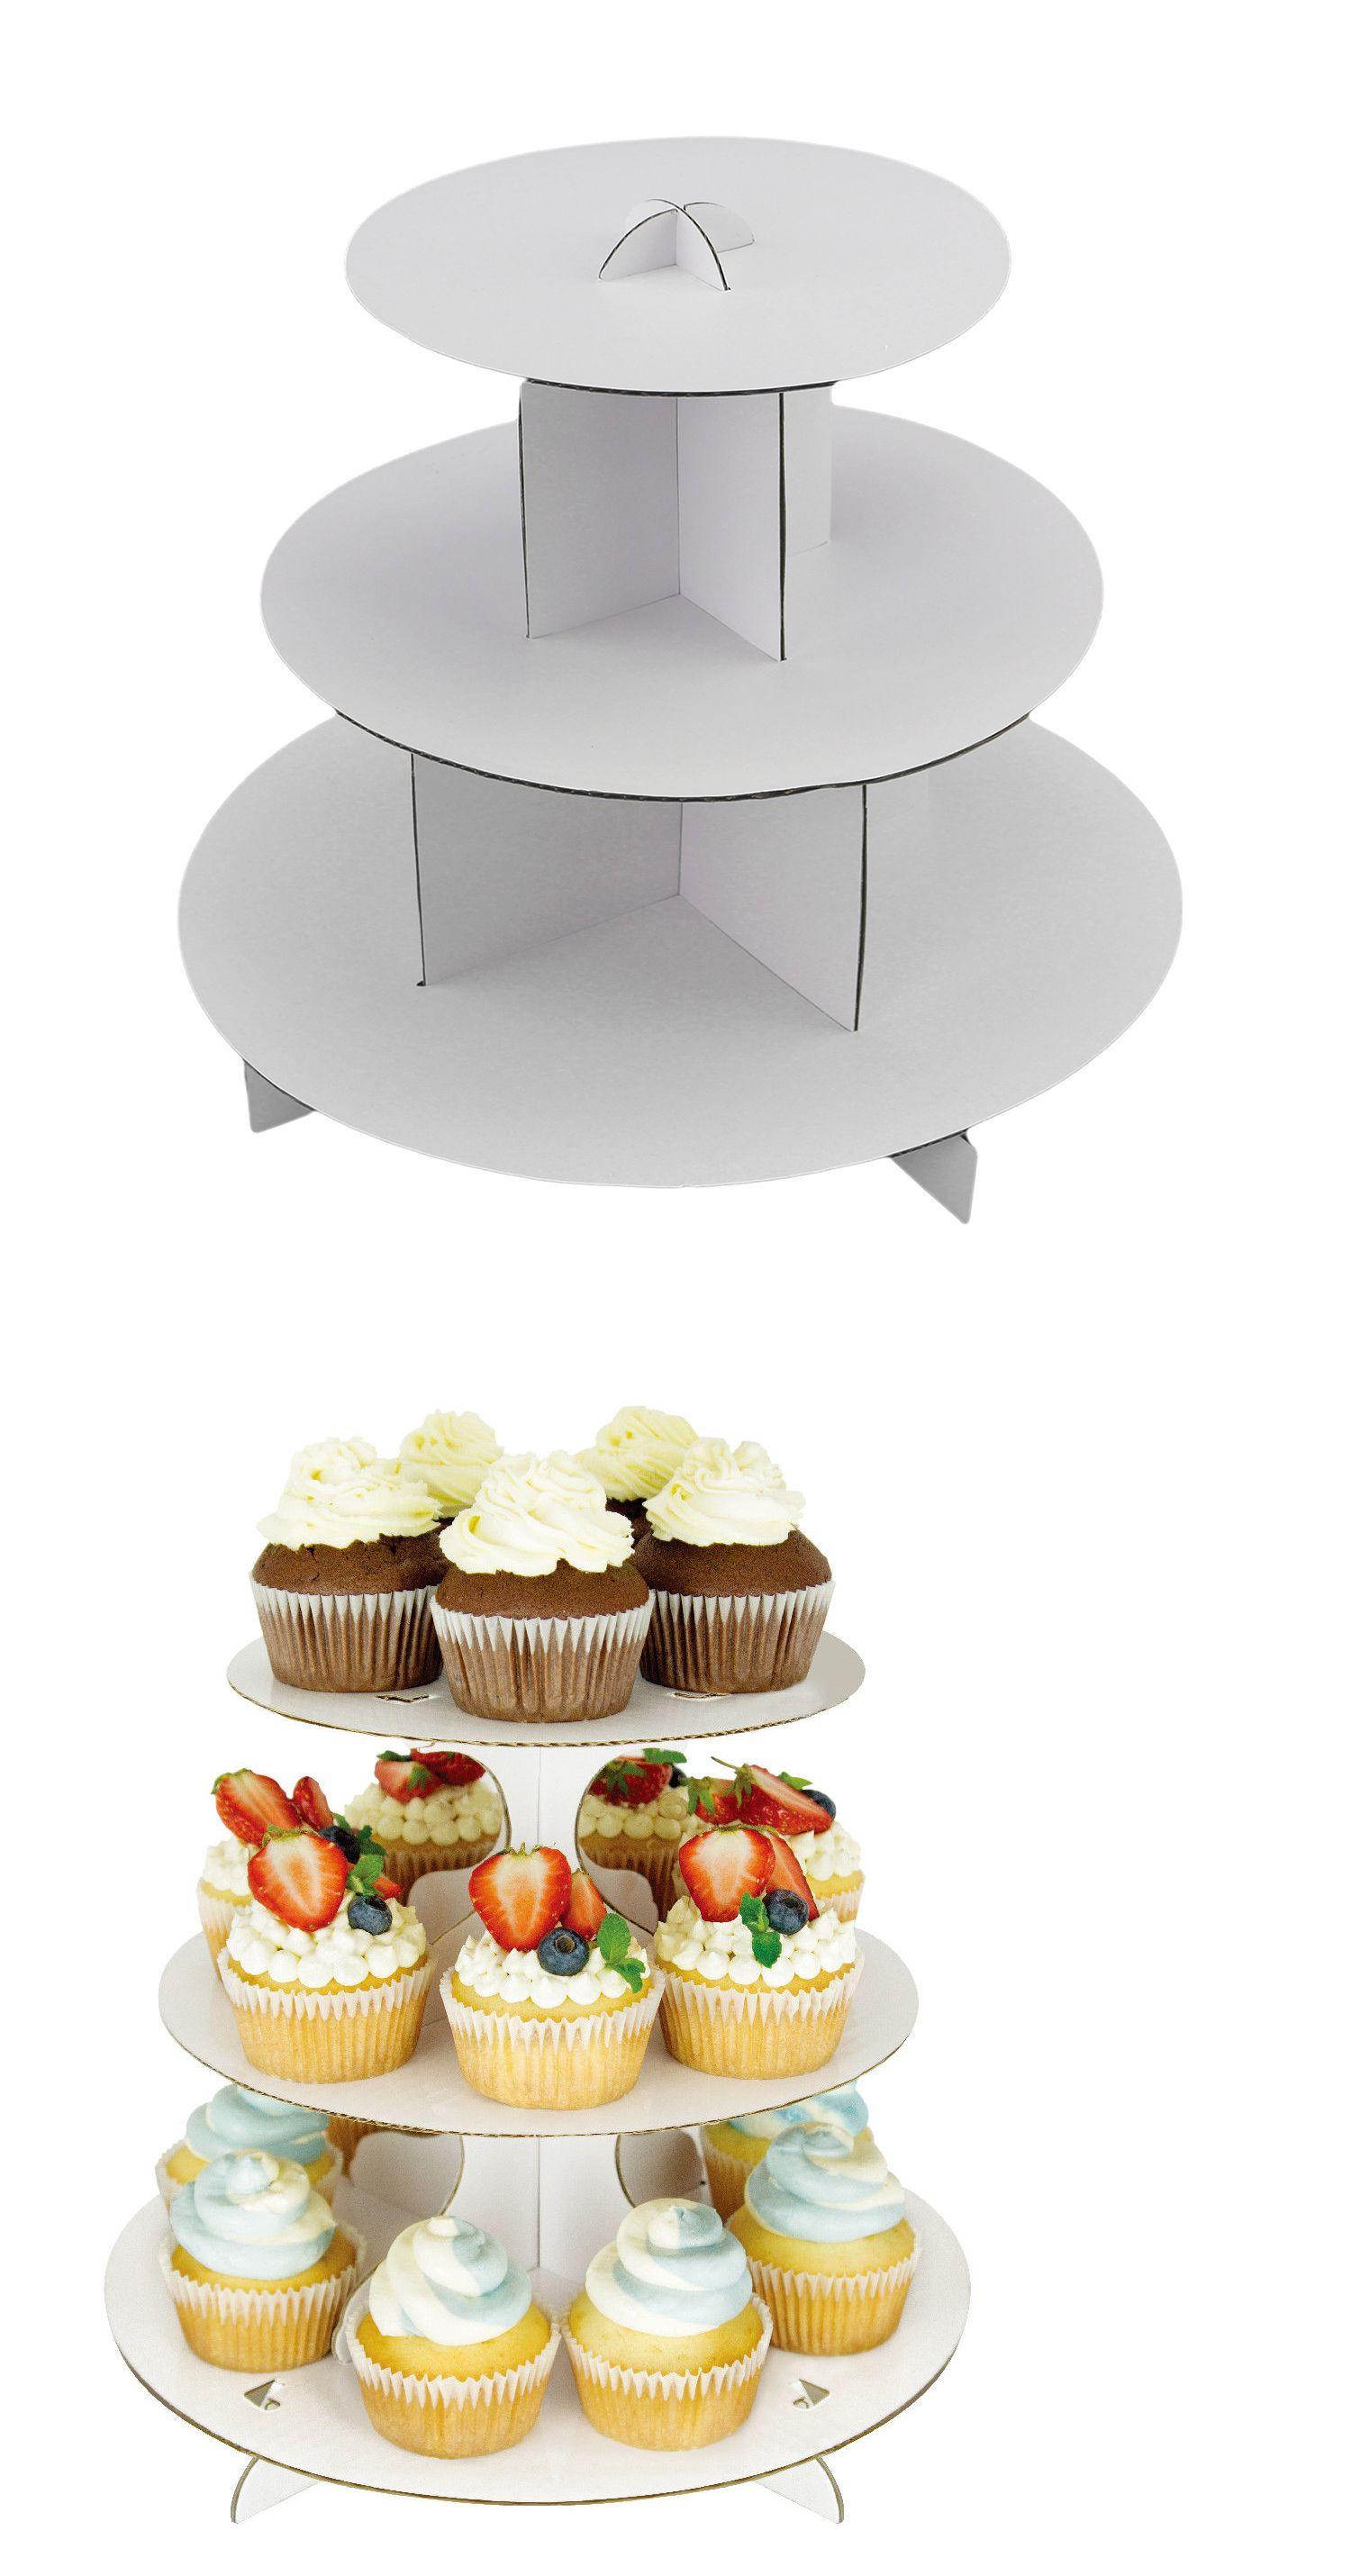 Details About 2pc Cupcake Display White Round Cardboard Pastry Dessert Tower Stand Cupcakes De Navidad Fiesta De Nube Decoracion De Cumpleanos